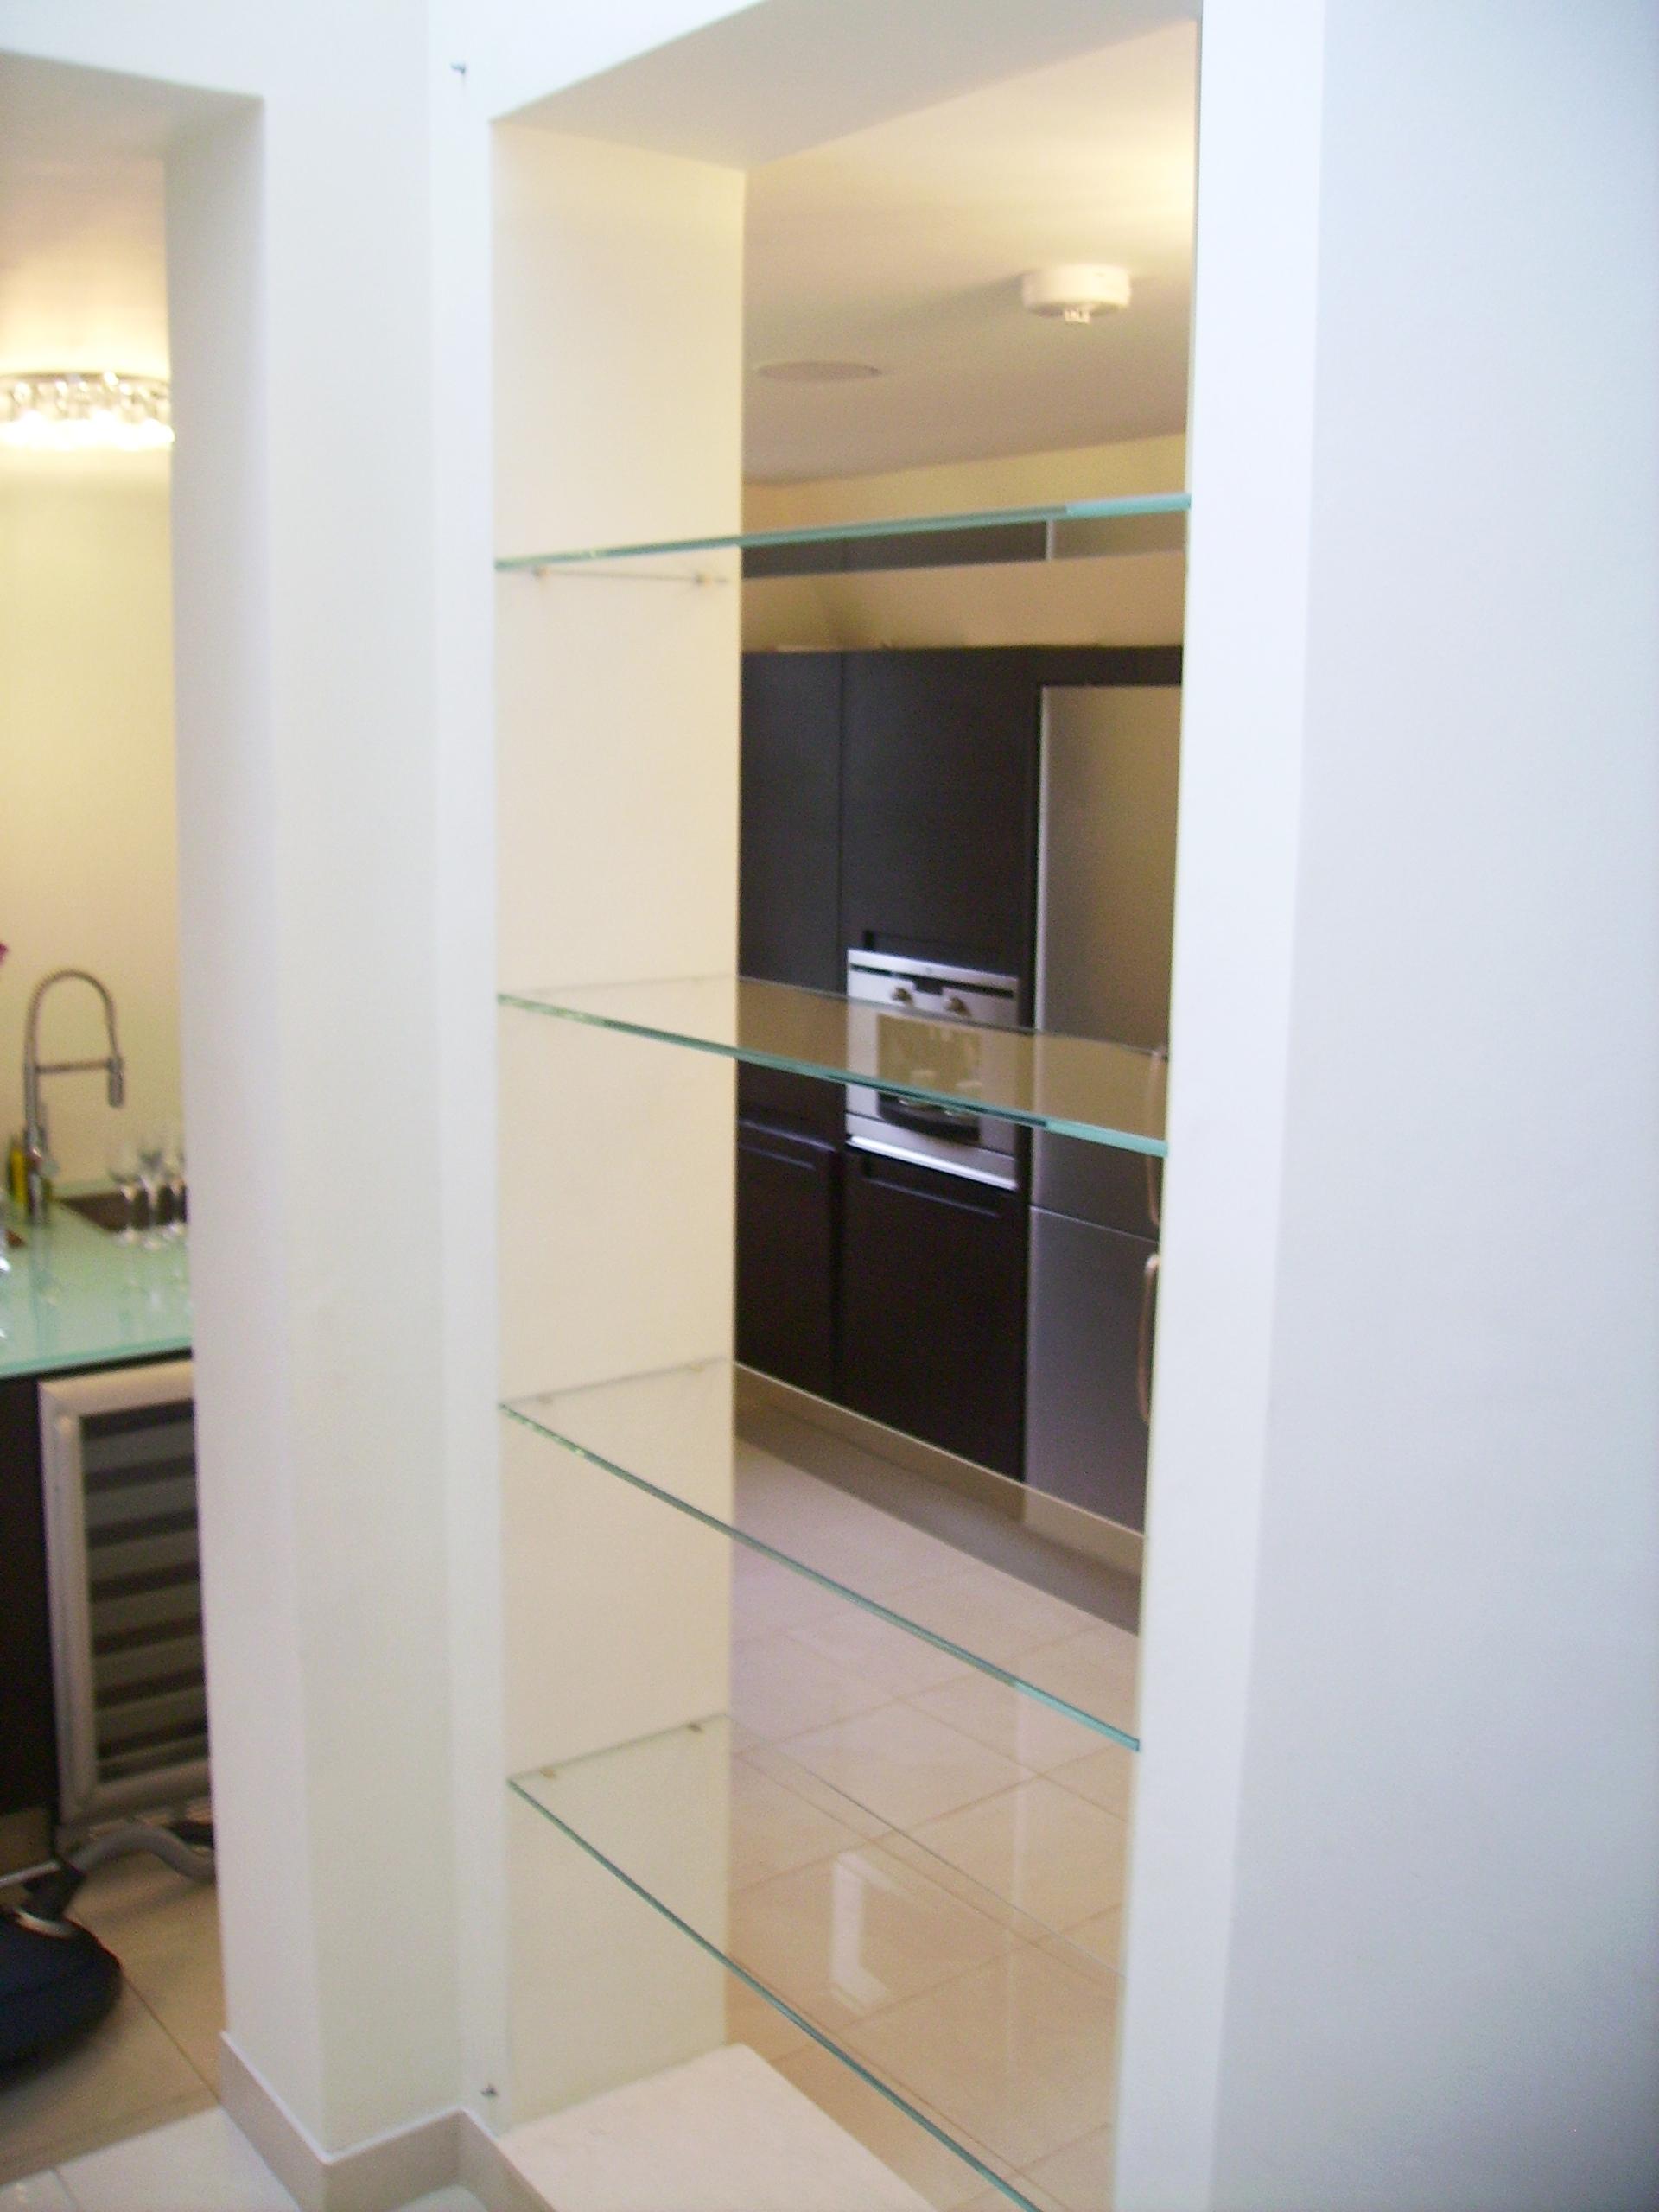 Glass Shelf - SW5 - London - Brompton Glass 1.JPG